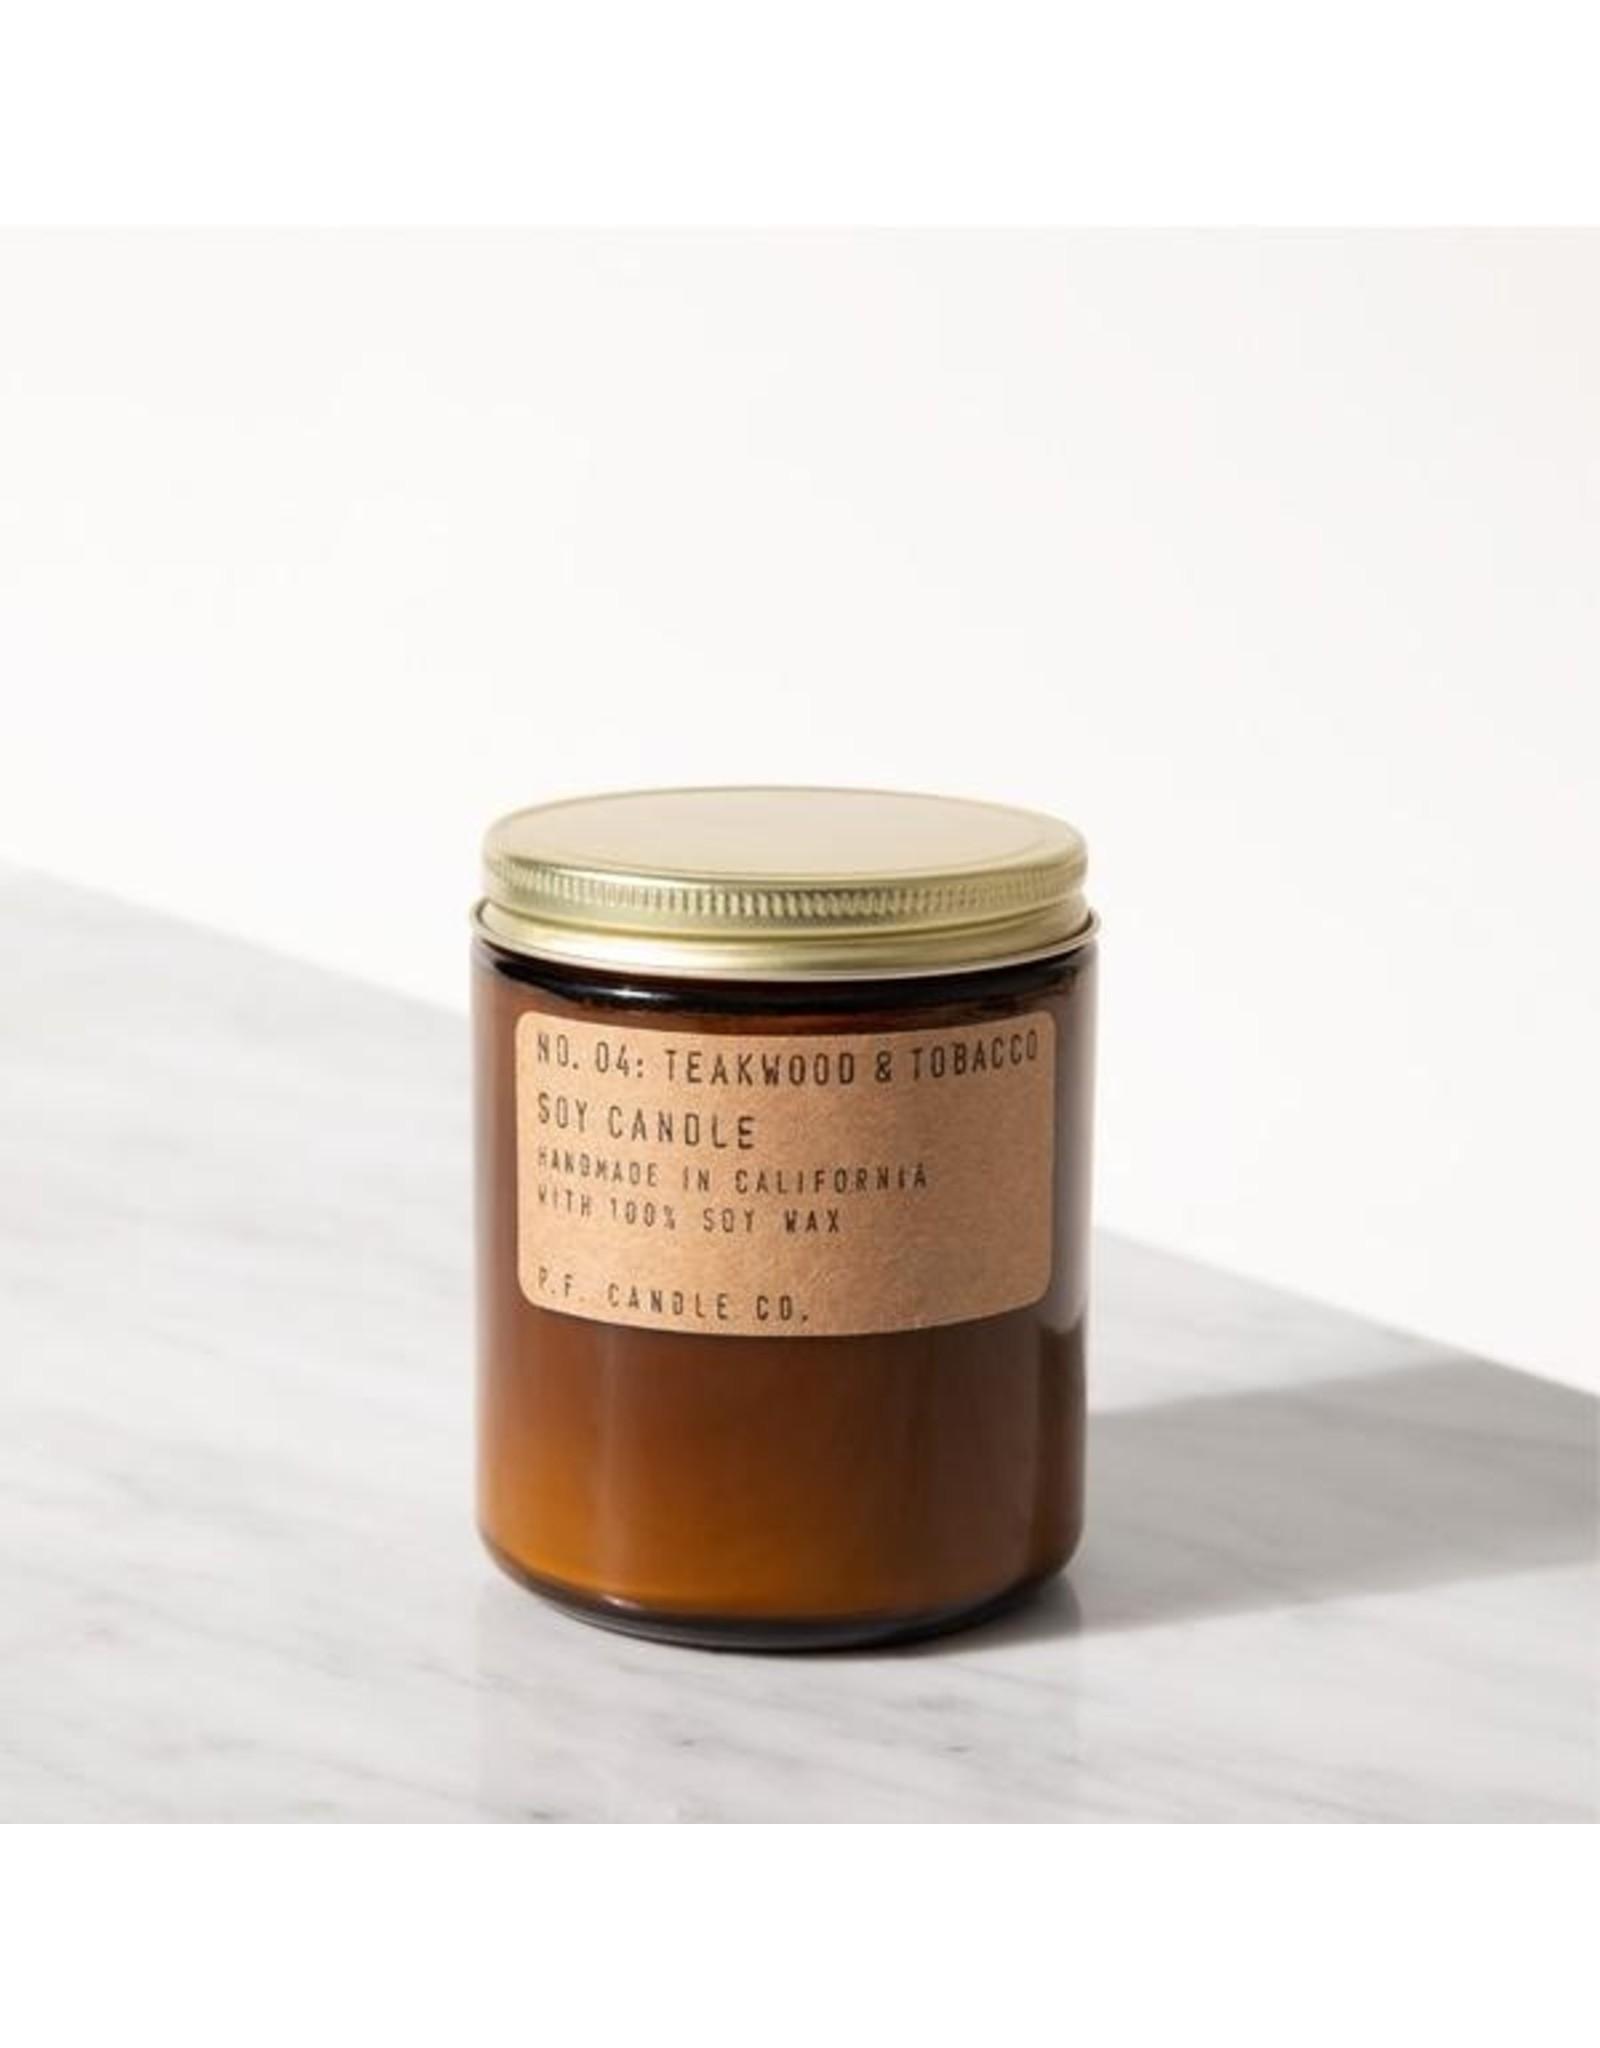 7.2 oz Soy Candle - Teakwood & Tobacco